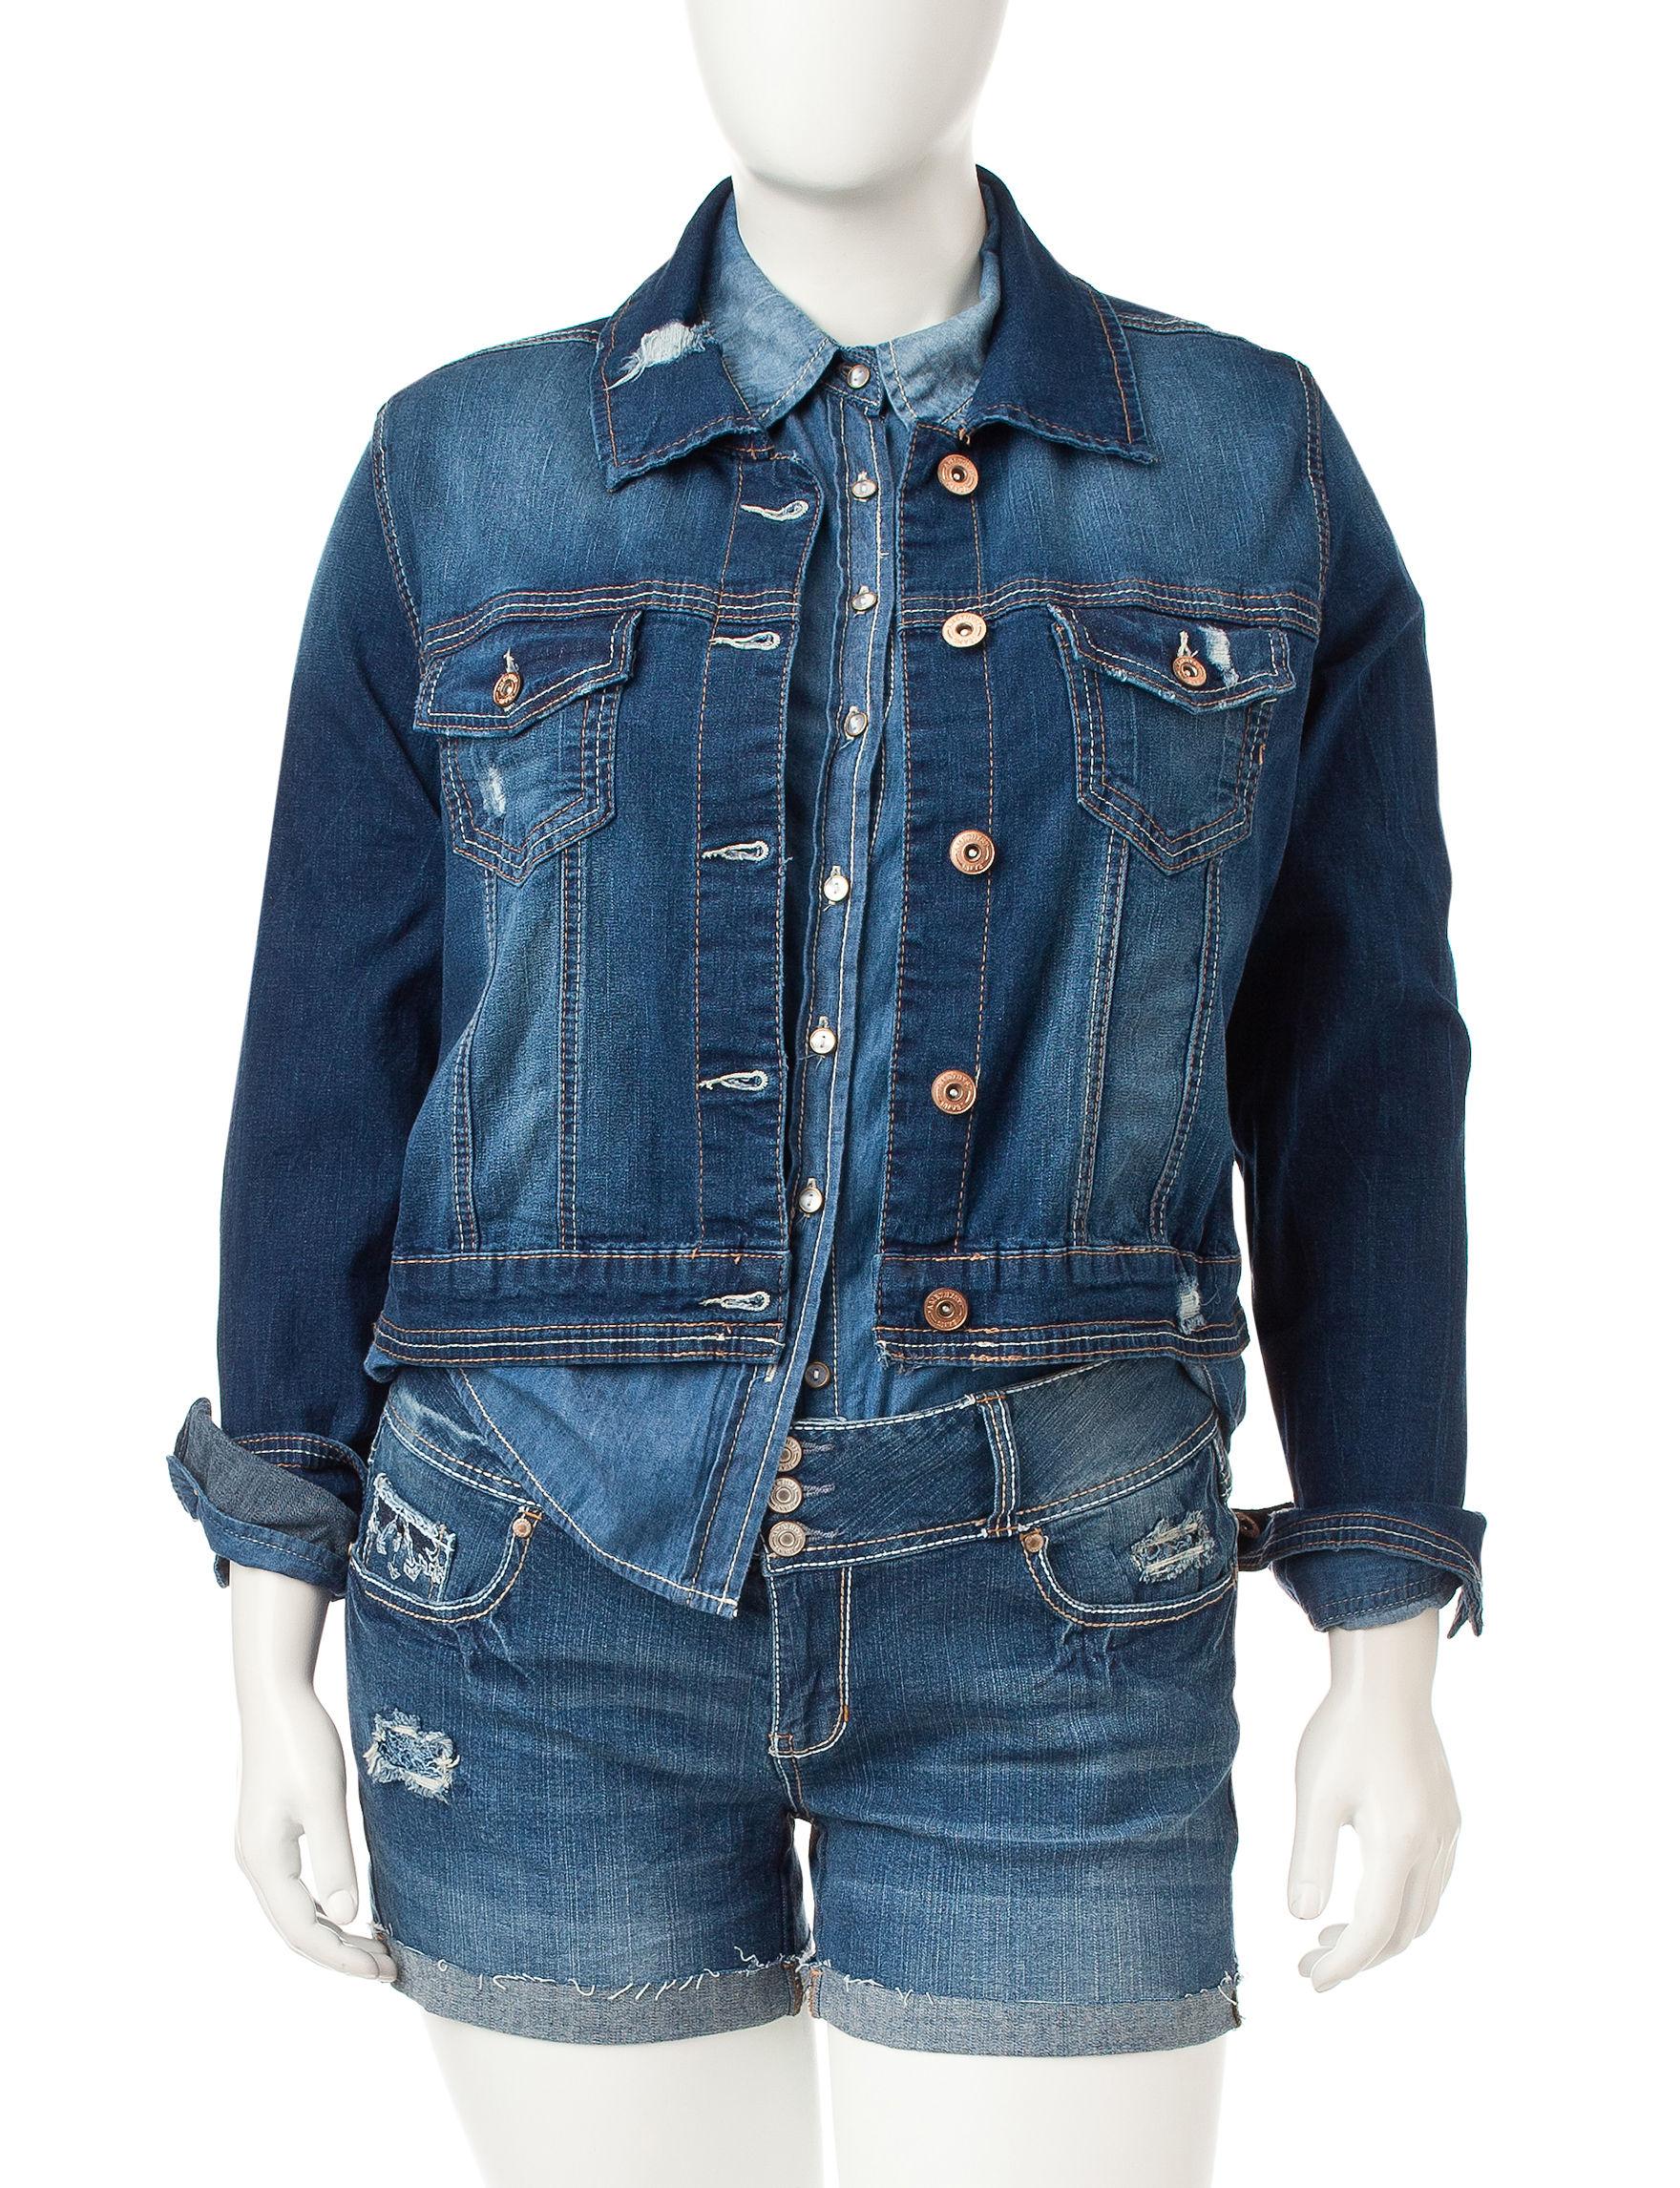 Amethyst Dark Blue - Rinse Denim Jackets